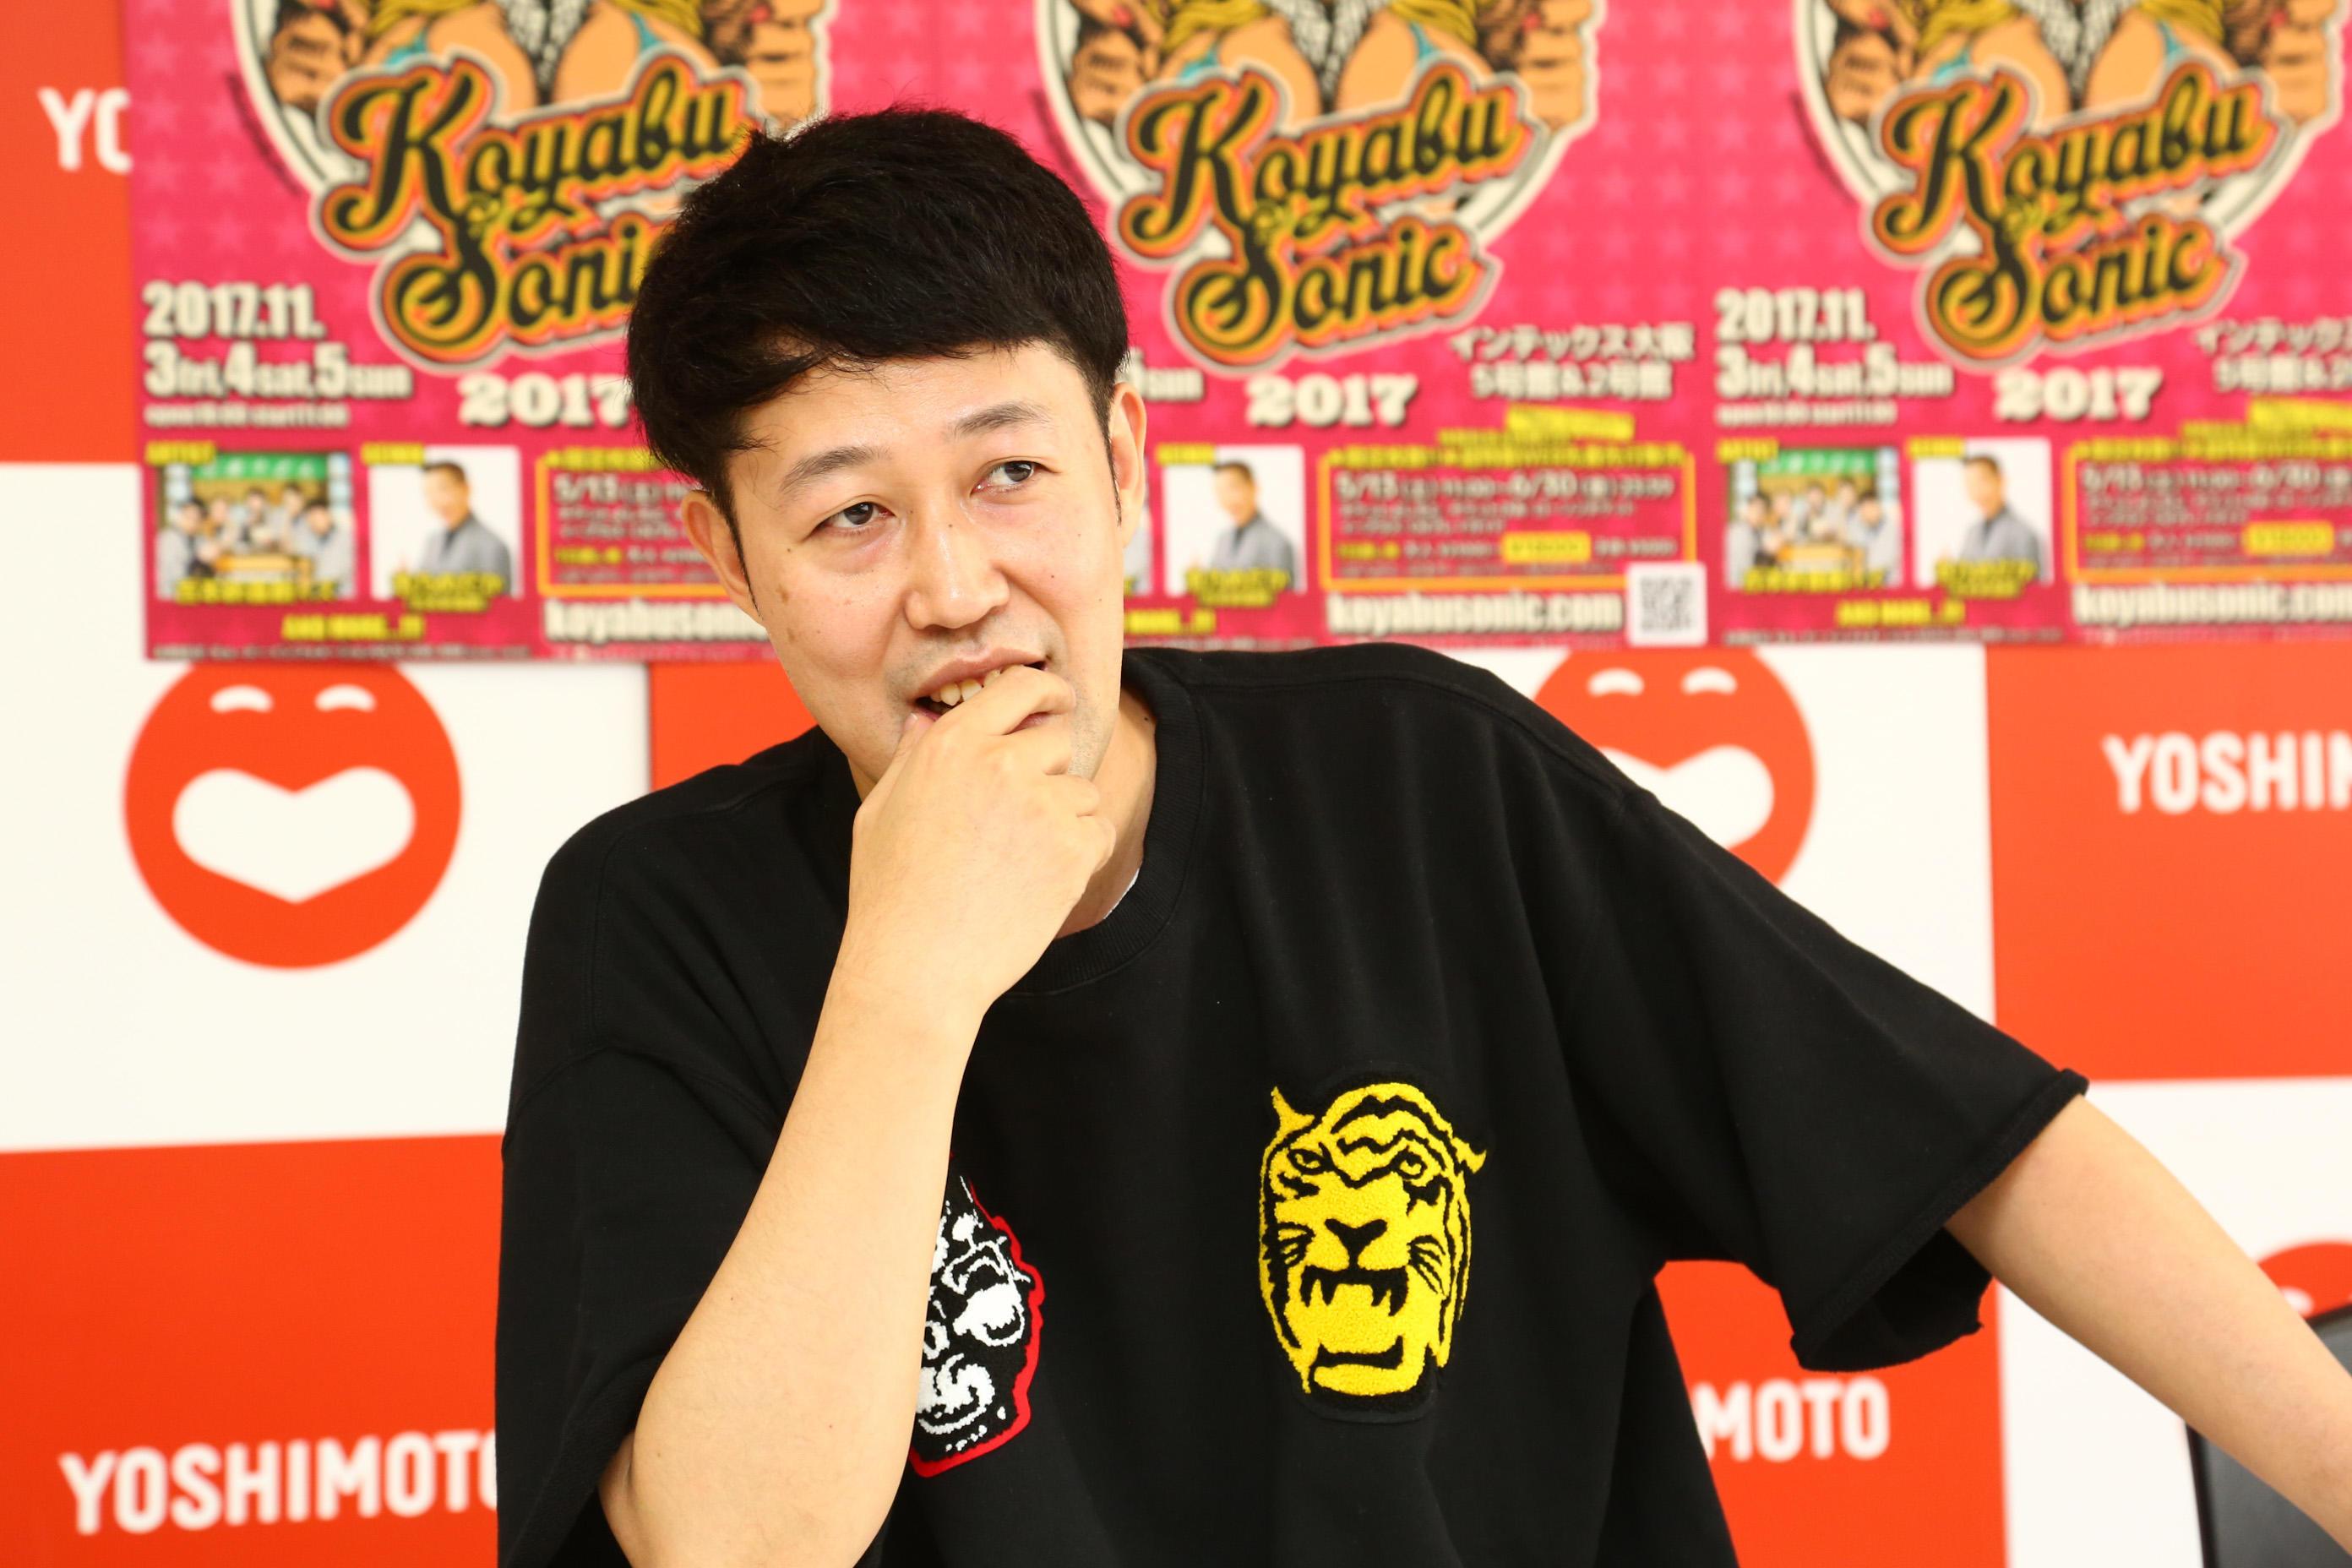 http://news.yoshimoto.co.jp/20170513032132-72220a0695d38fe592976139d6c9abf775f95757.jpg